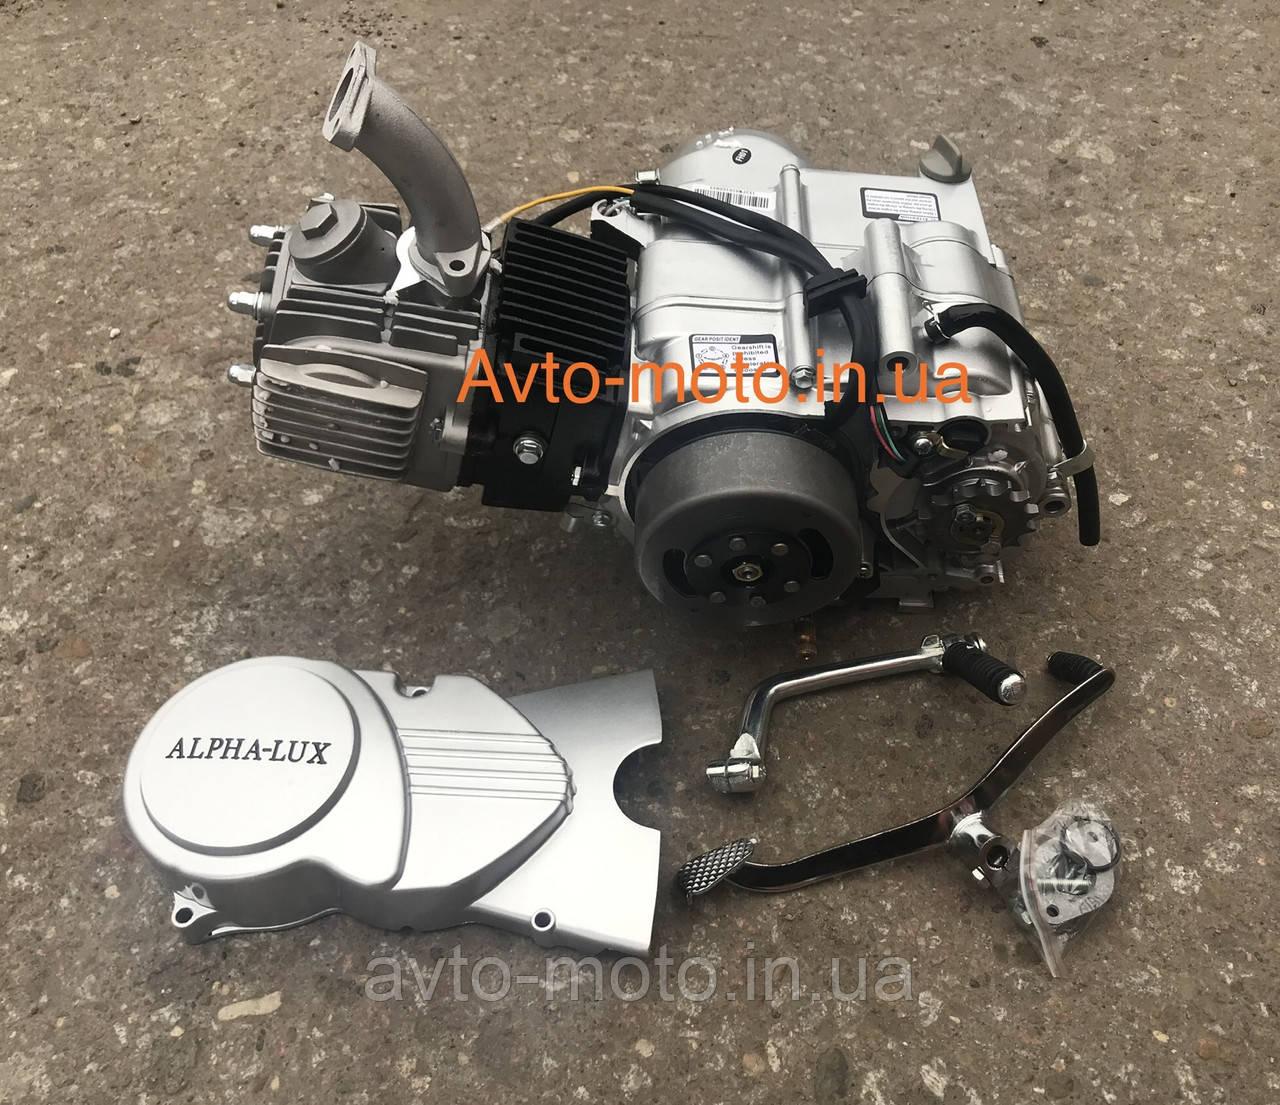 Двигун Дельта/Альфа 110 см3 без стартера механіка